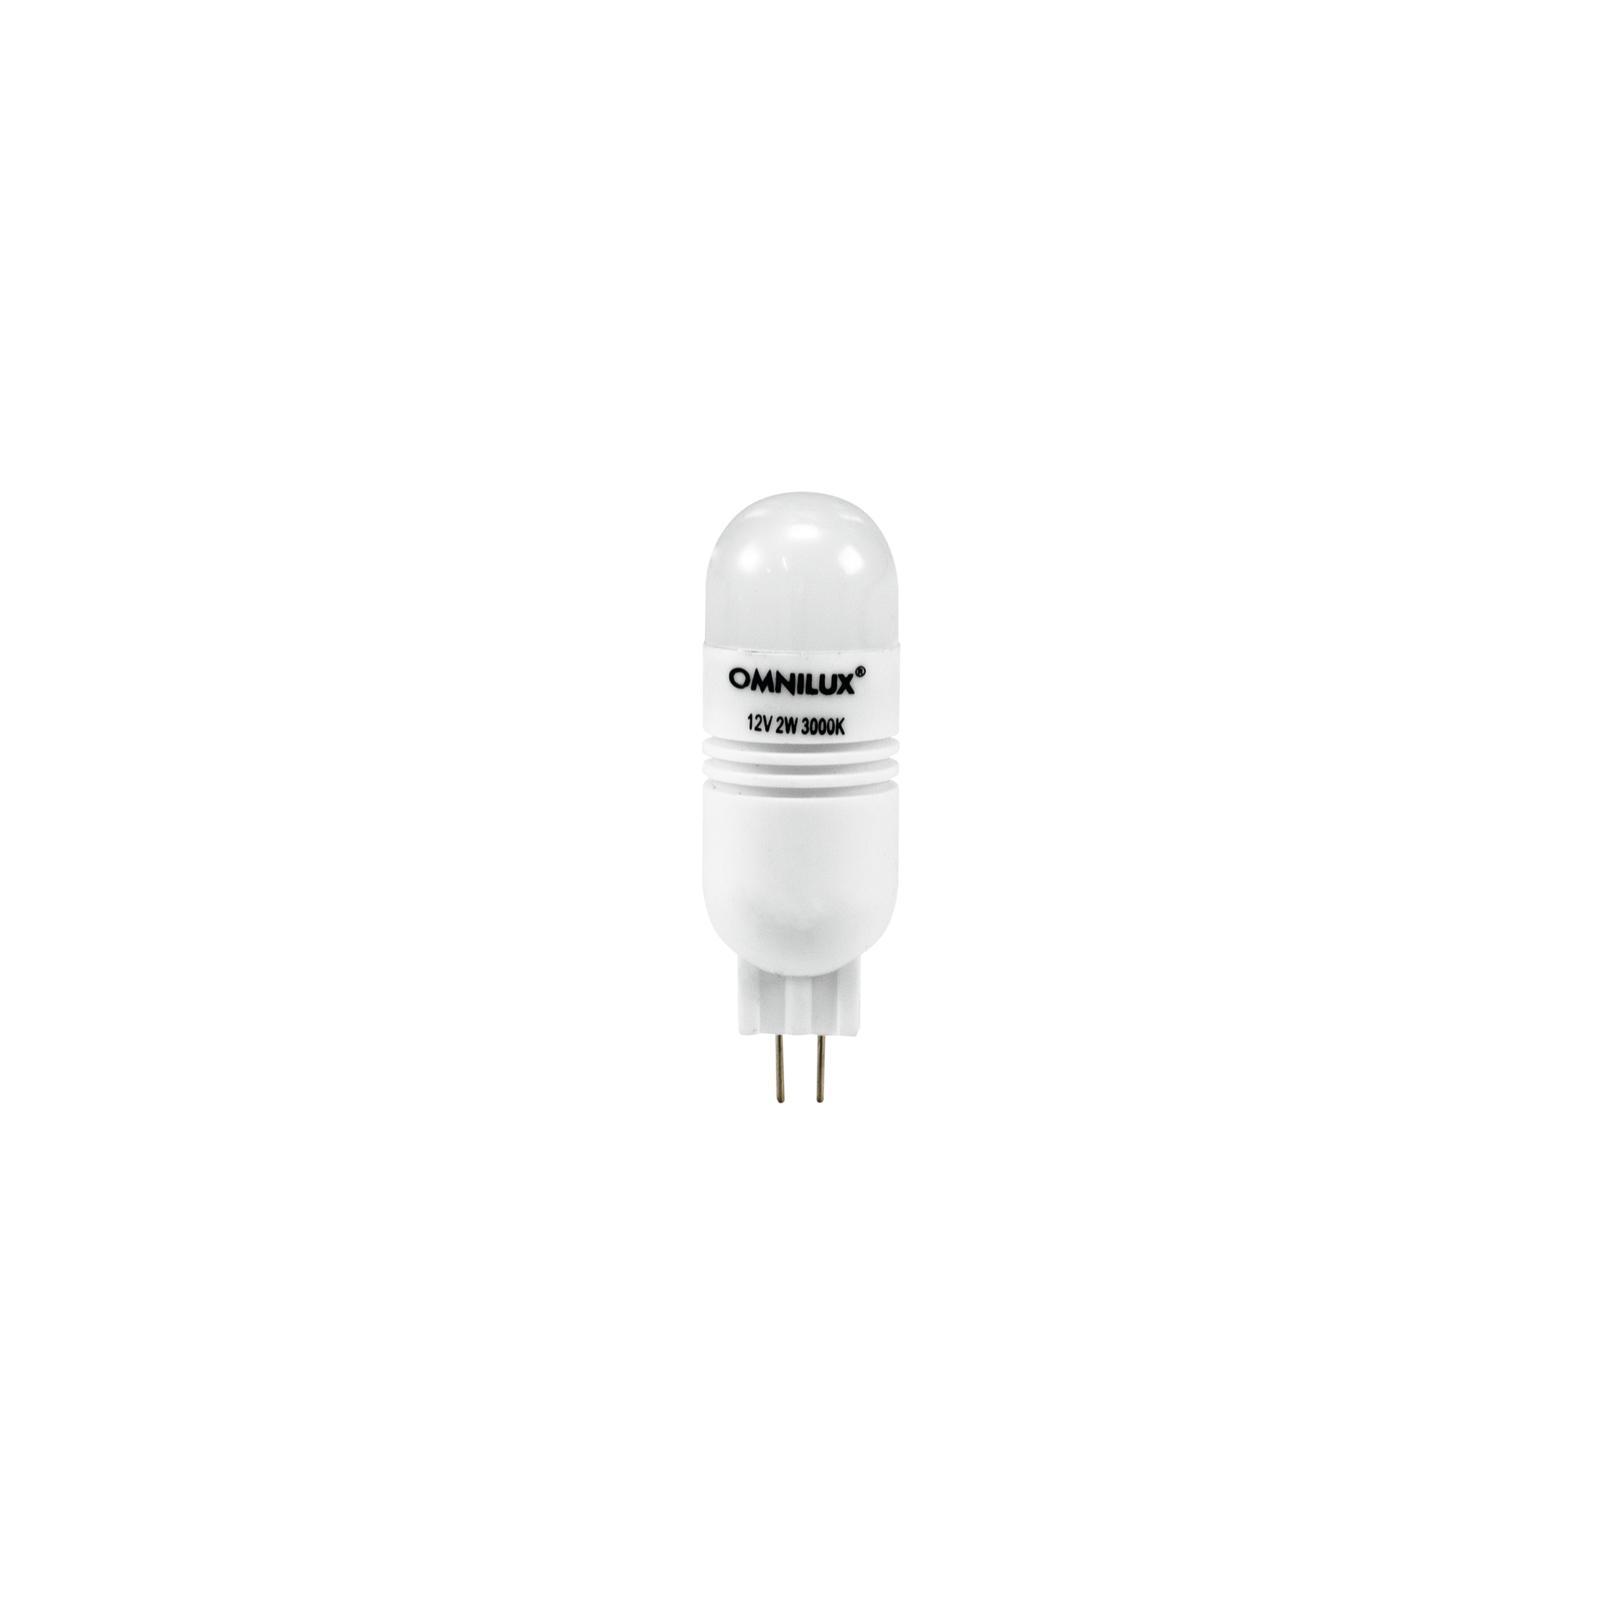 OMNILUX LED 230V 2,5W G-9 3000K